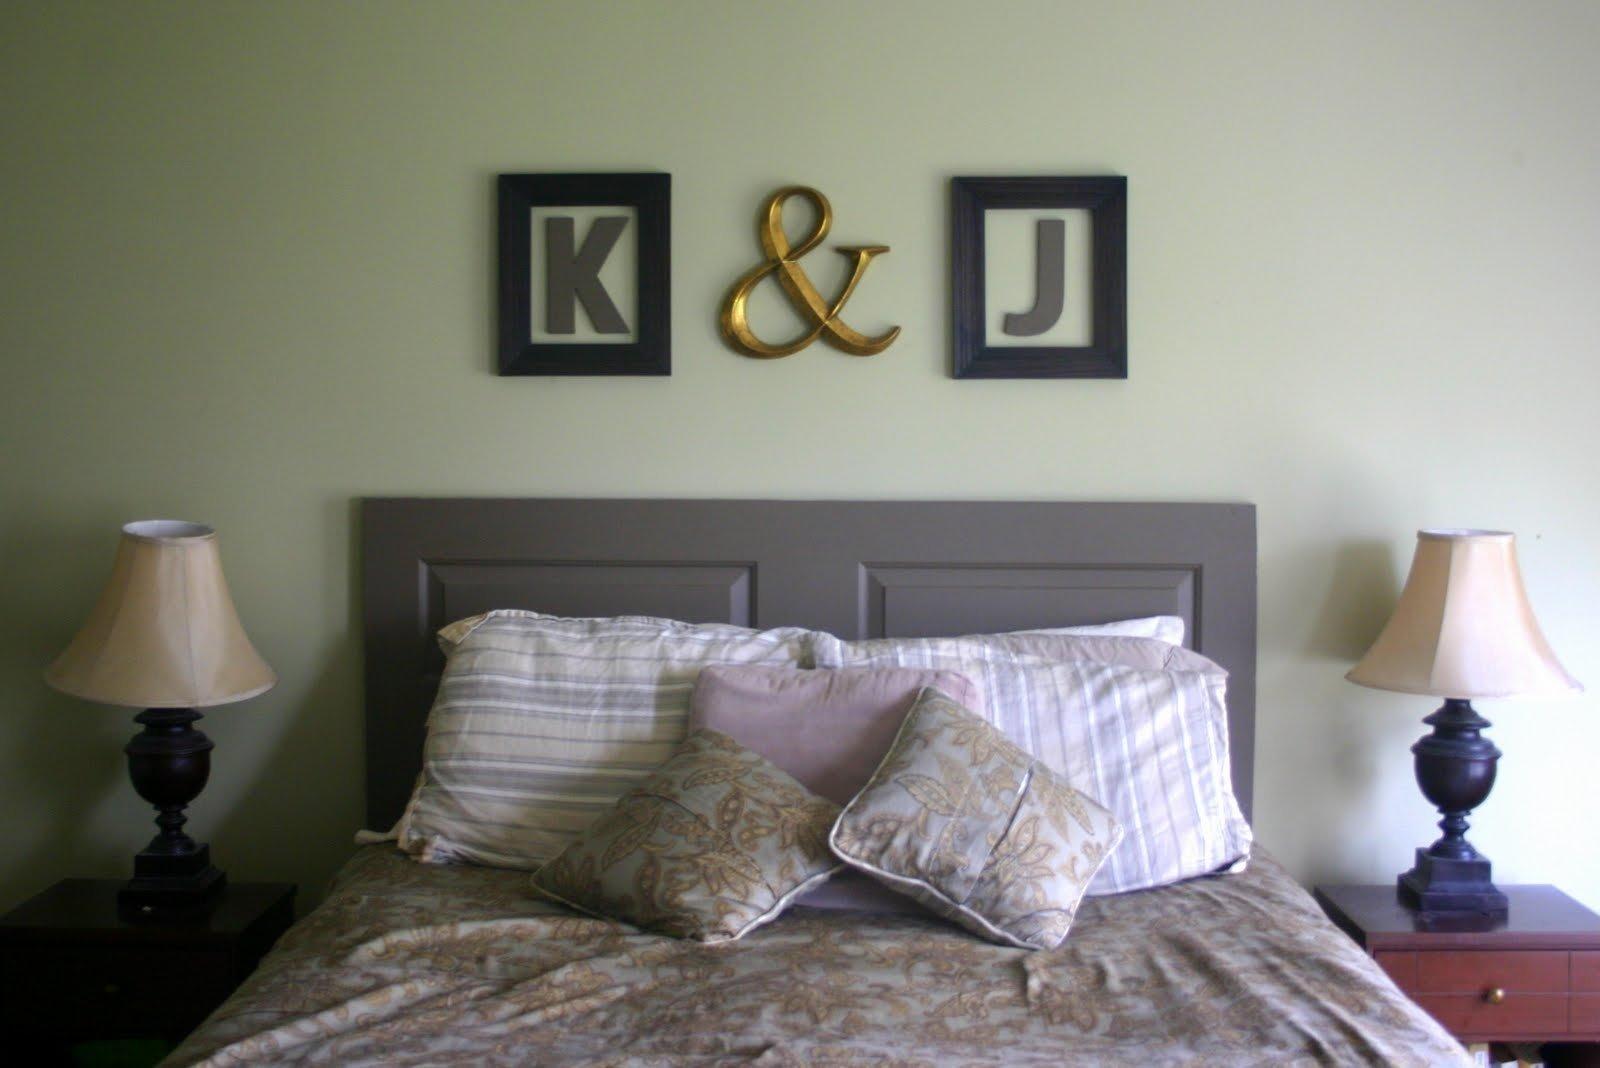 diy headboard ideas for queen beds - amys office